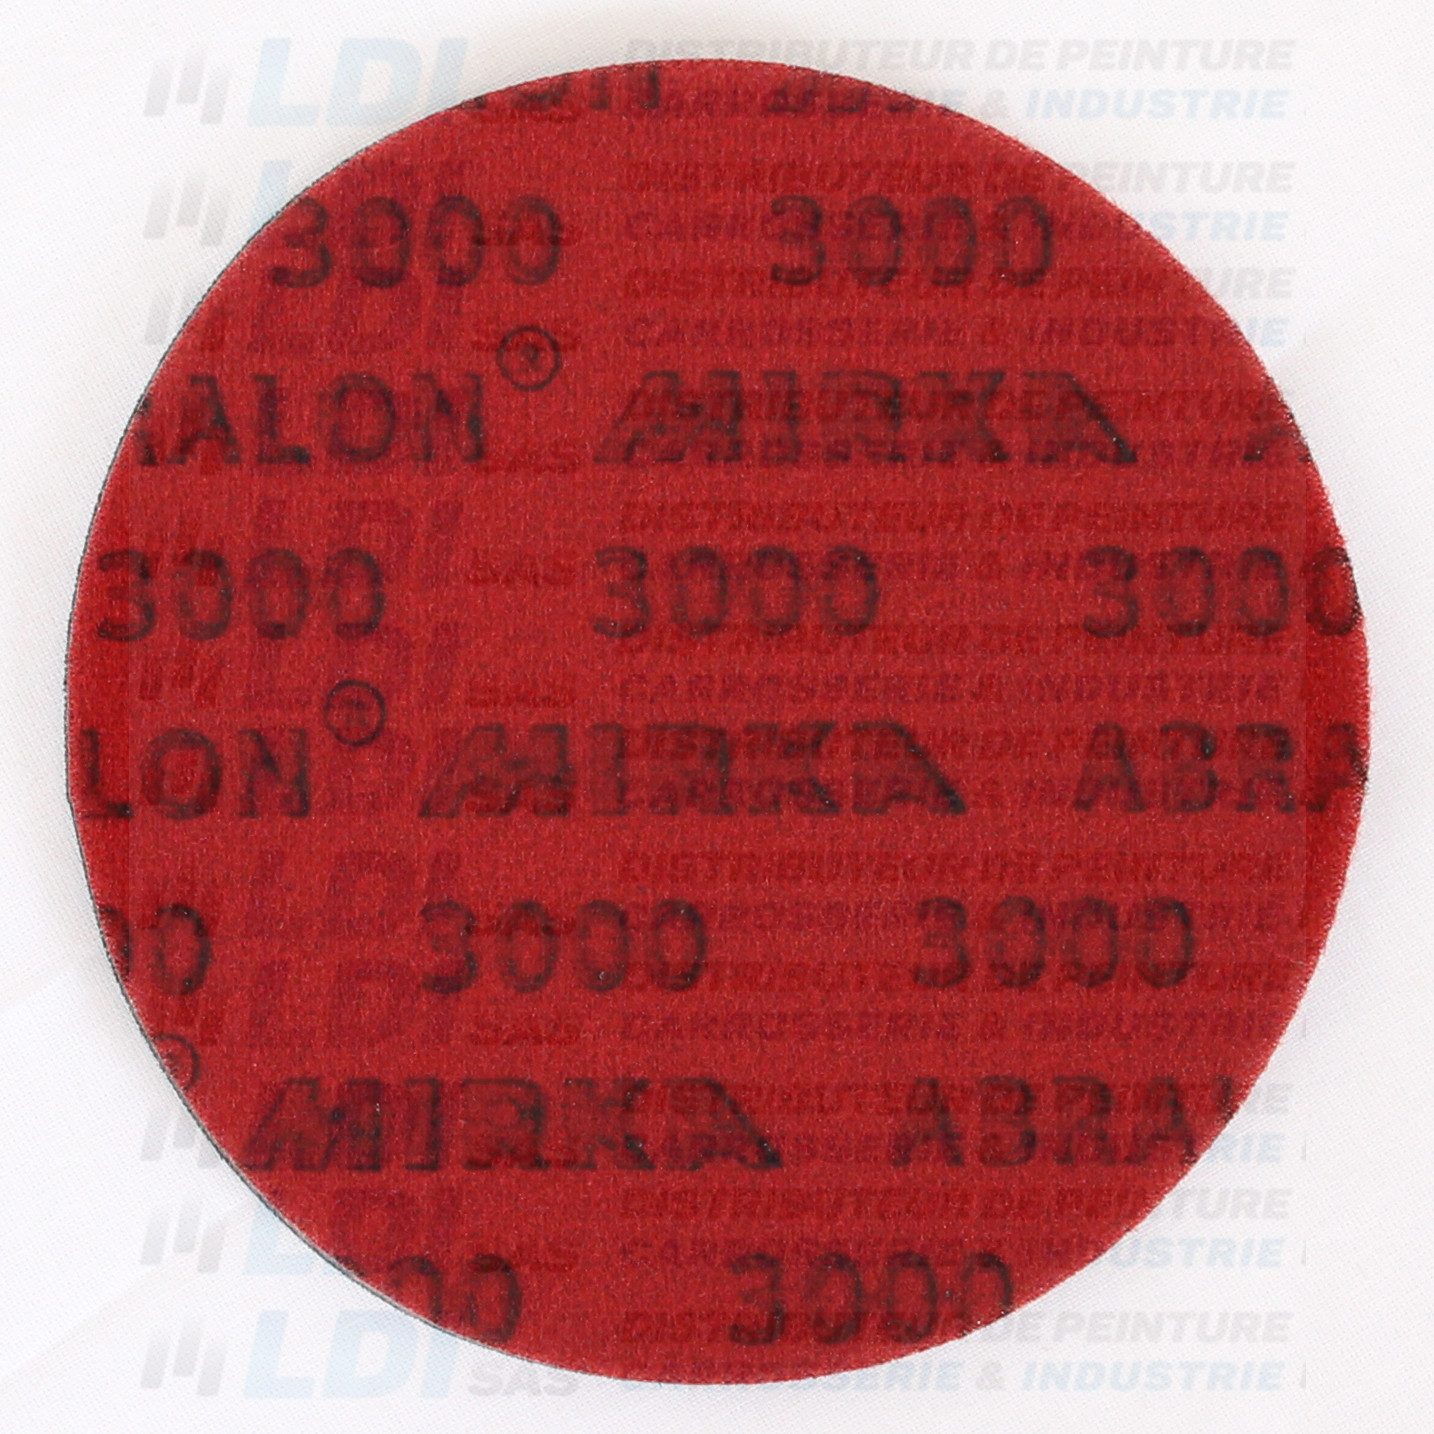 DISQUE ABRALON D150 P1000 X20